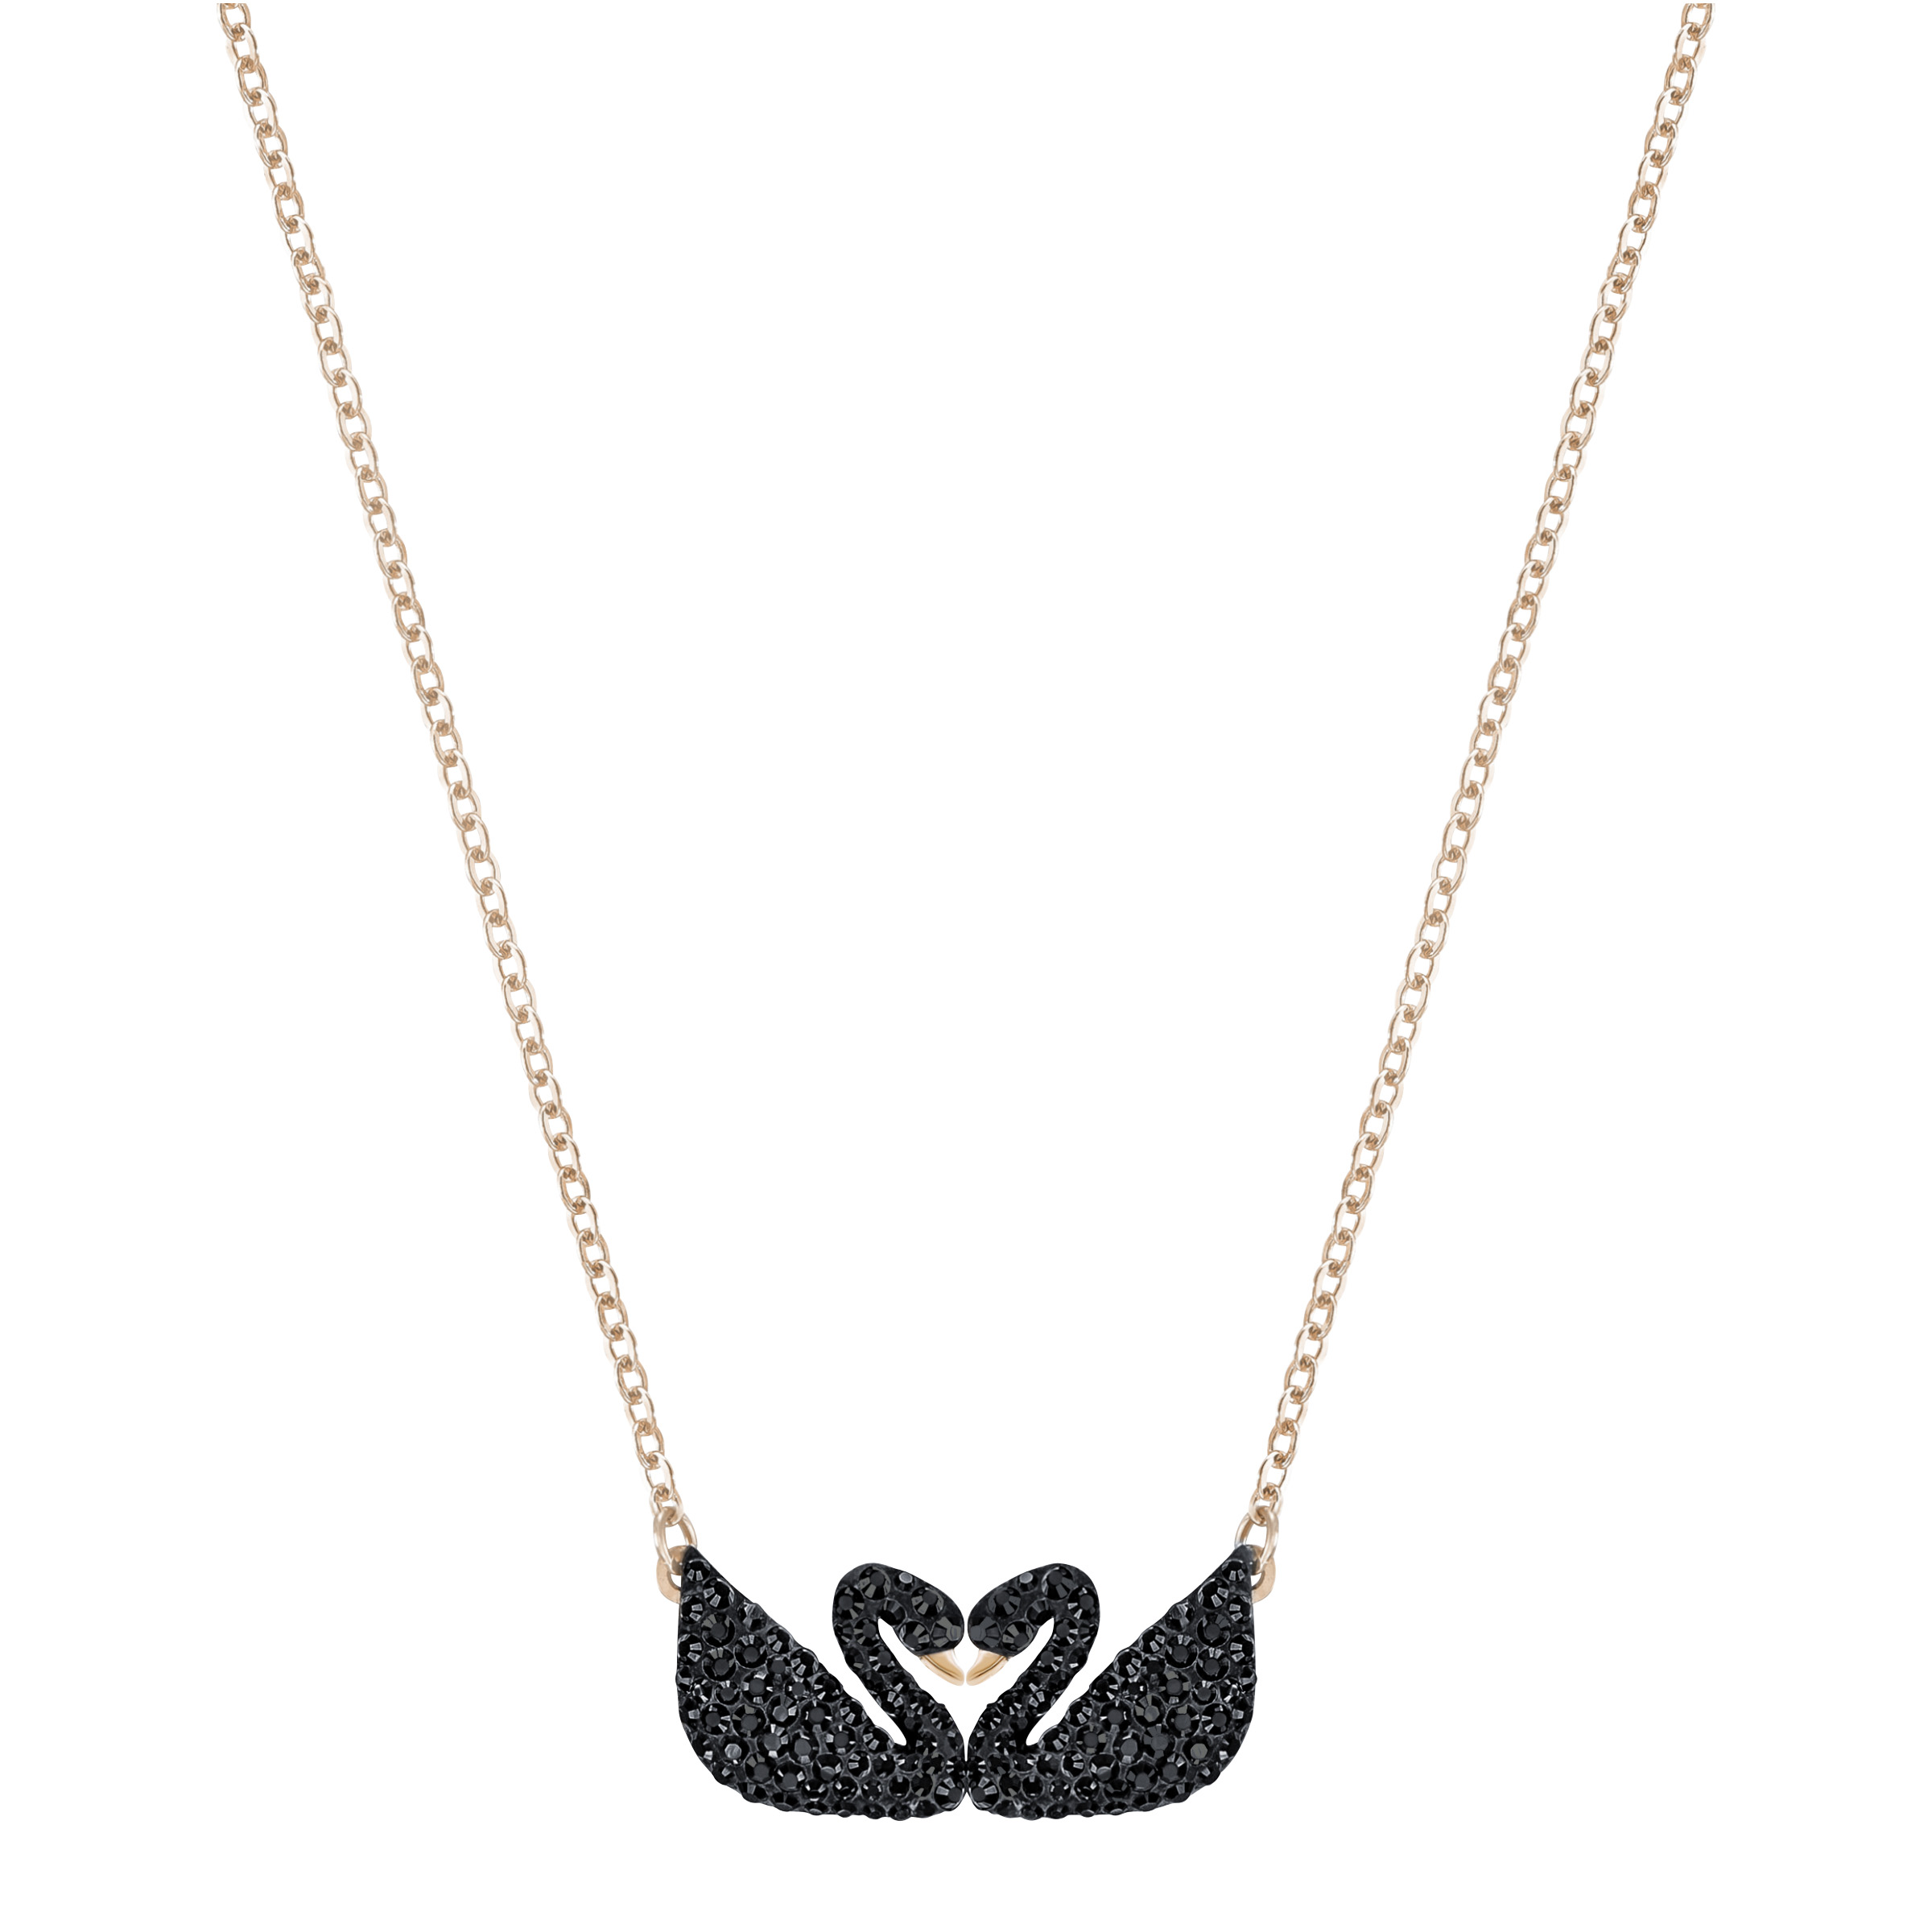 Collier Swarovski Iconic Swan, noir, Métal doré rose, Swarovski